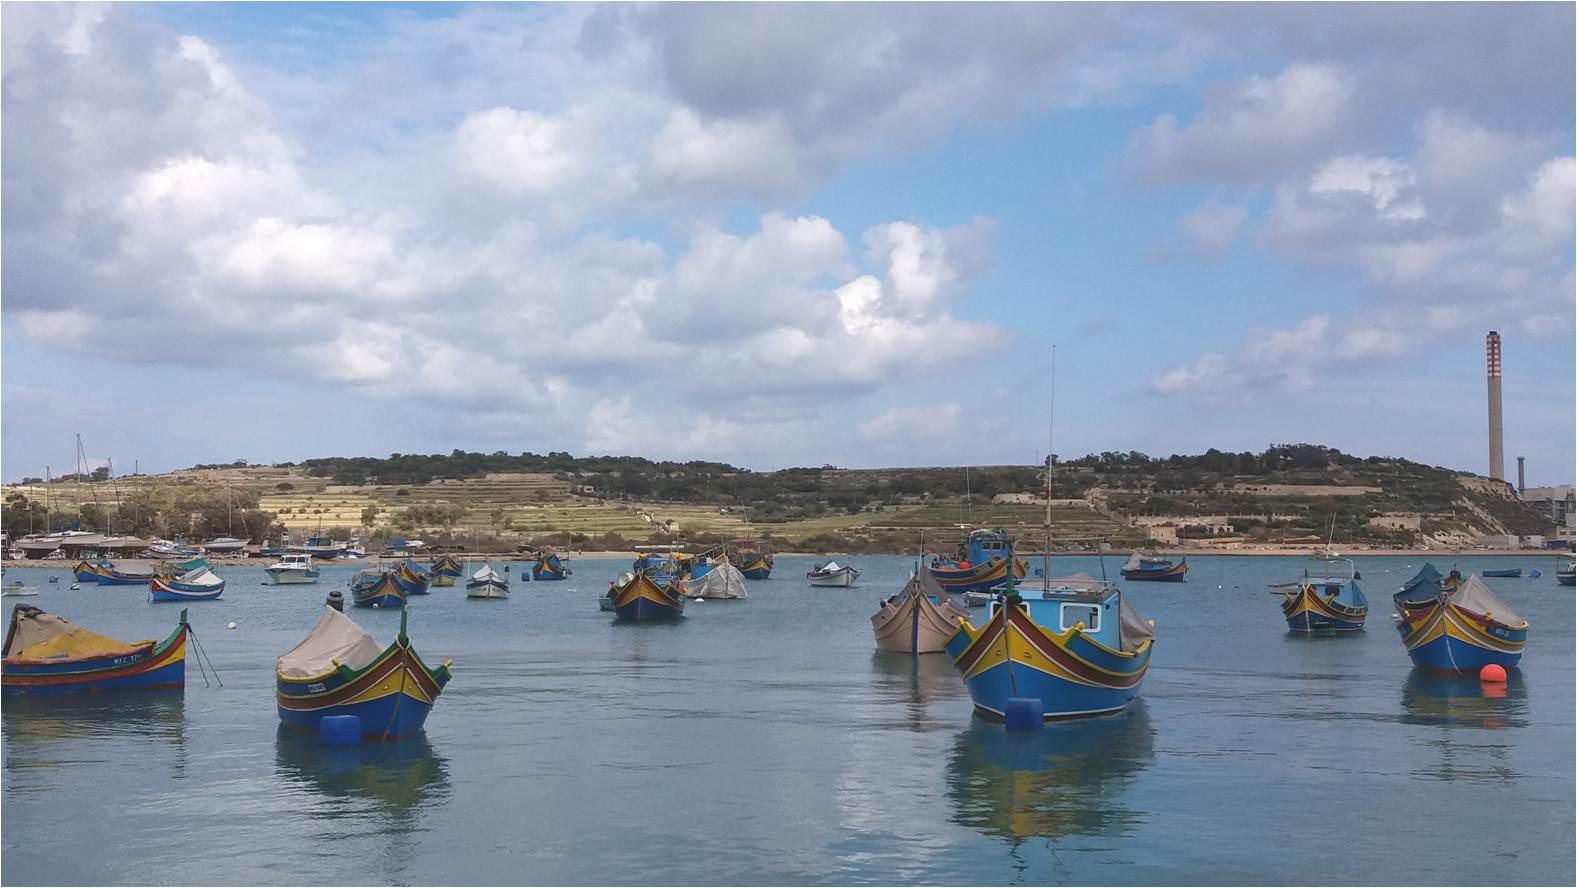 Qué ver en Malta - Marsaxlokk